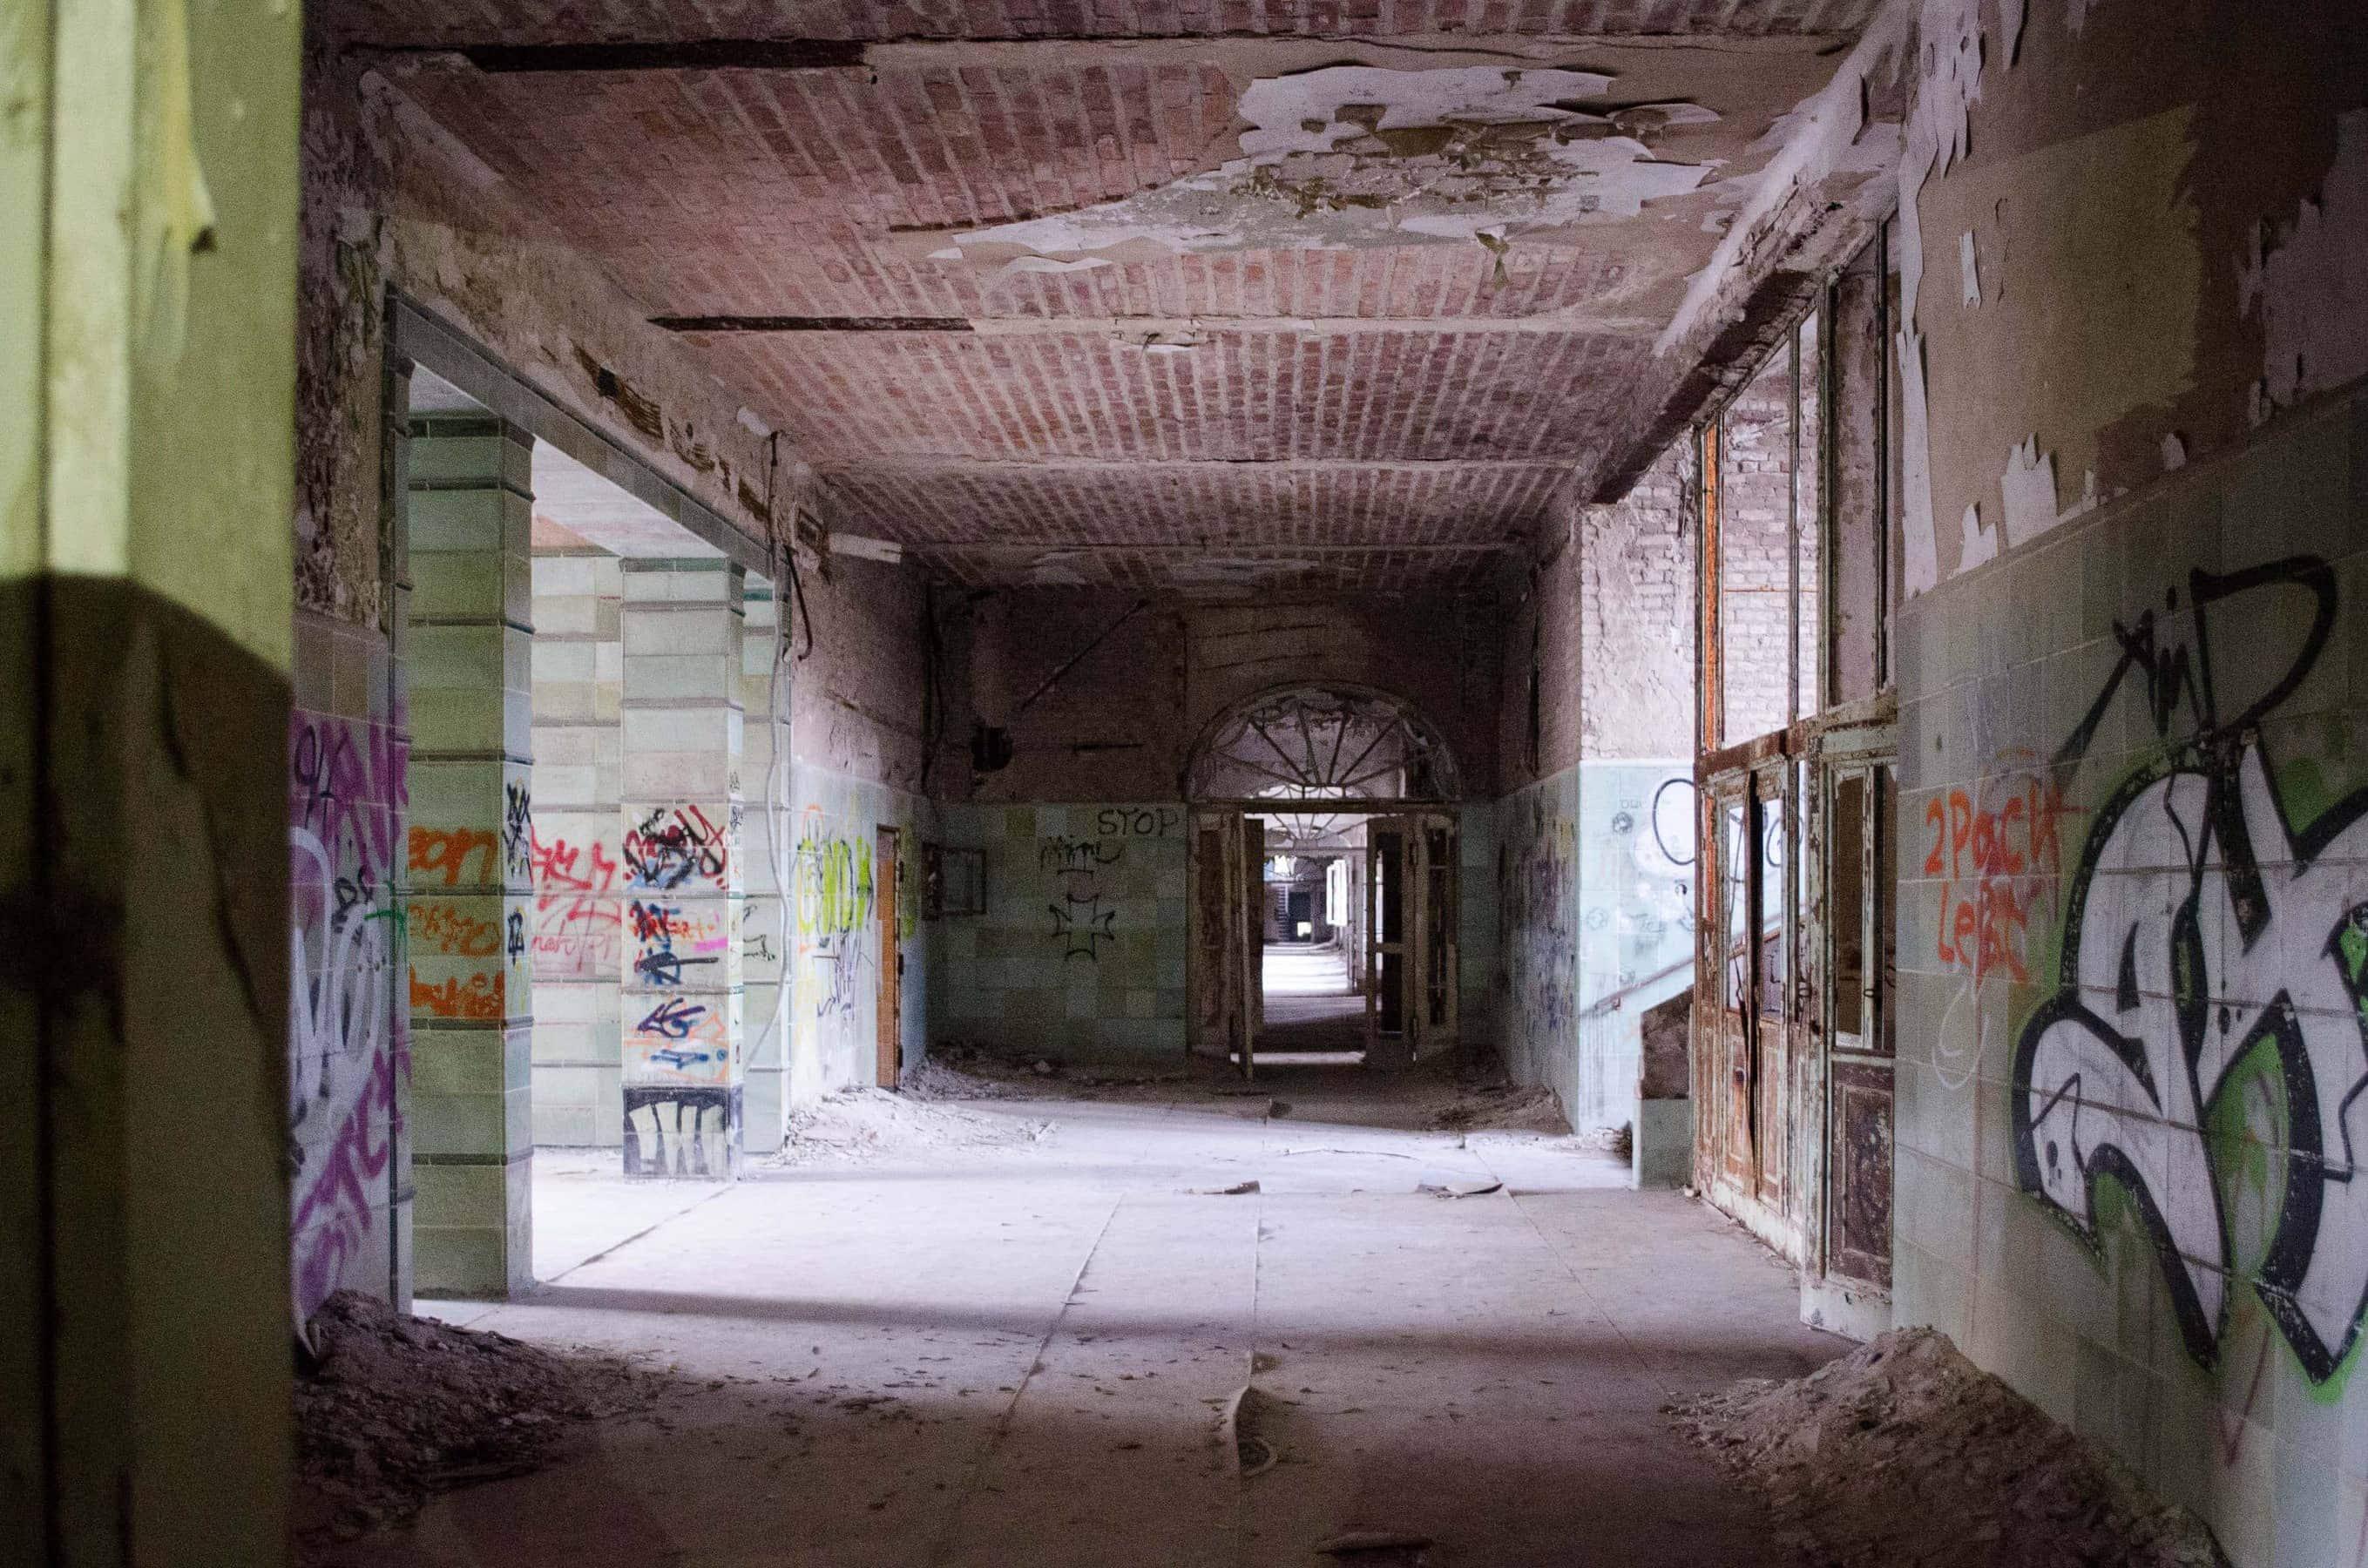 Beelitz-Heilstätten Alte Chirurgie